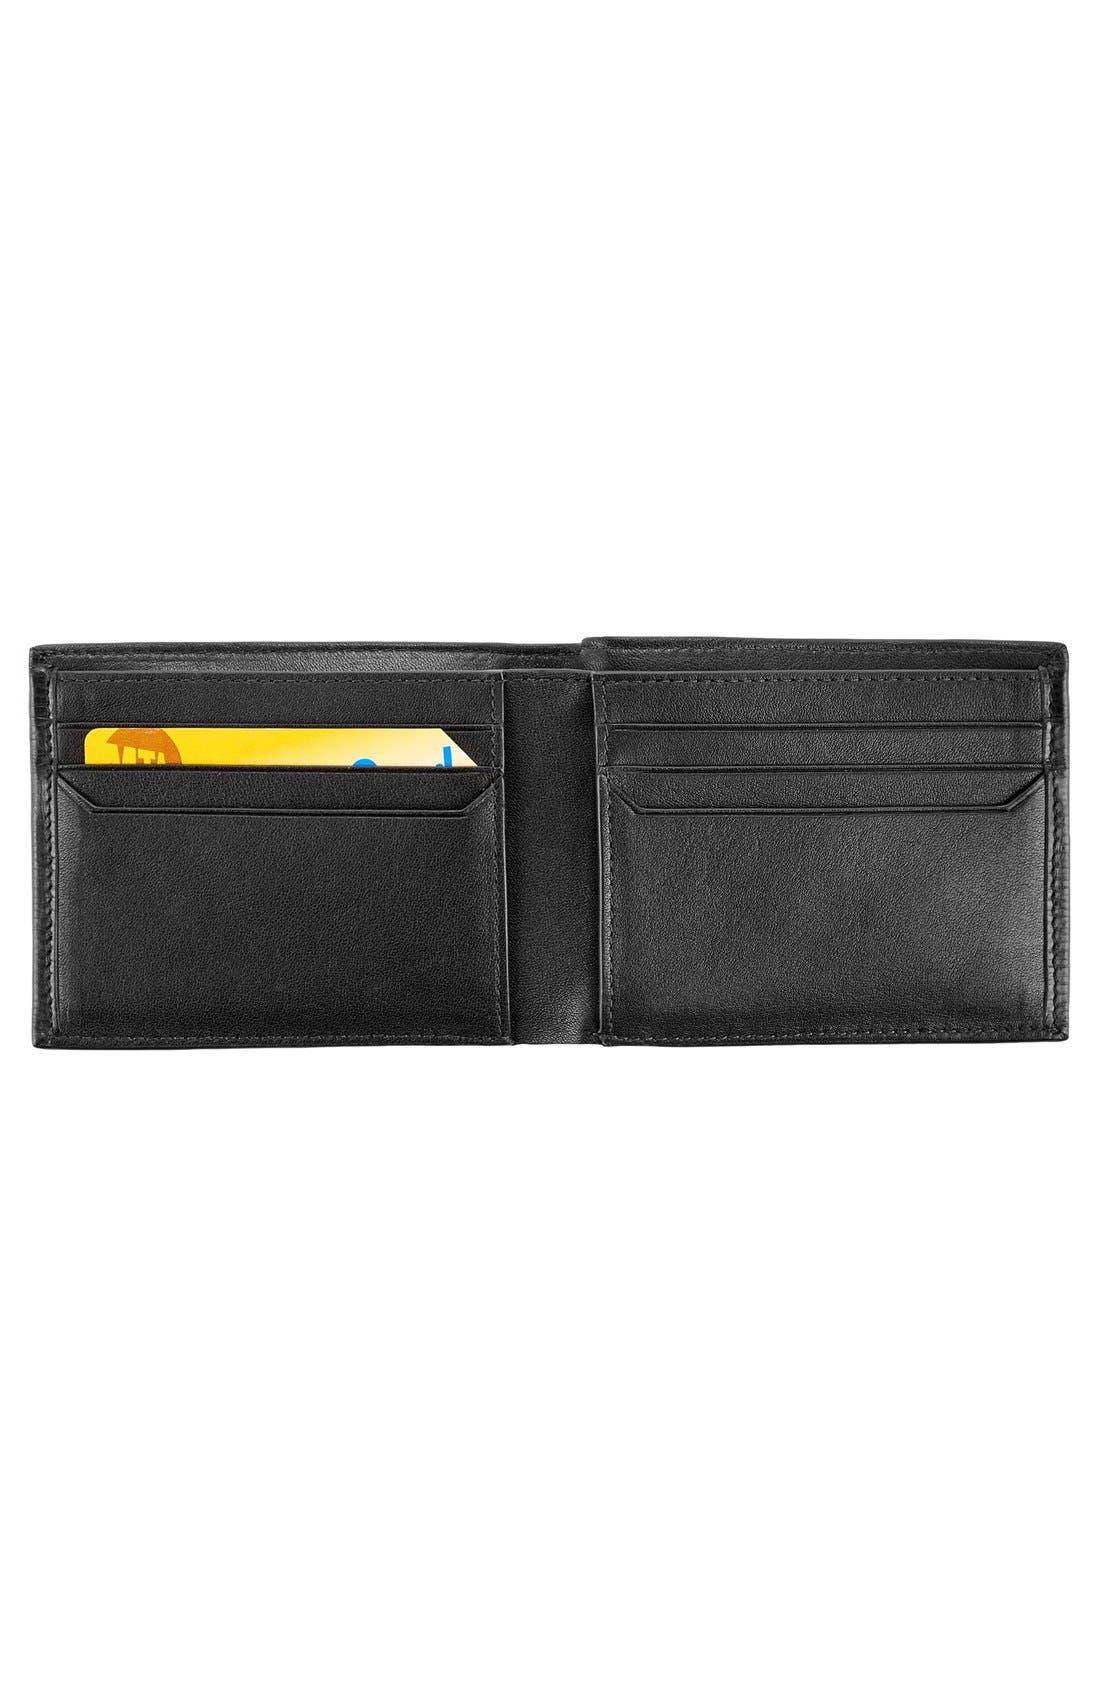 Alternate Image 2  - Tumi Monaco Double Billfold Leather Wallet